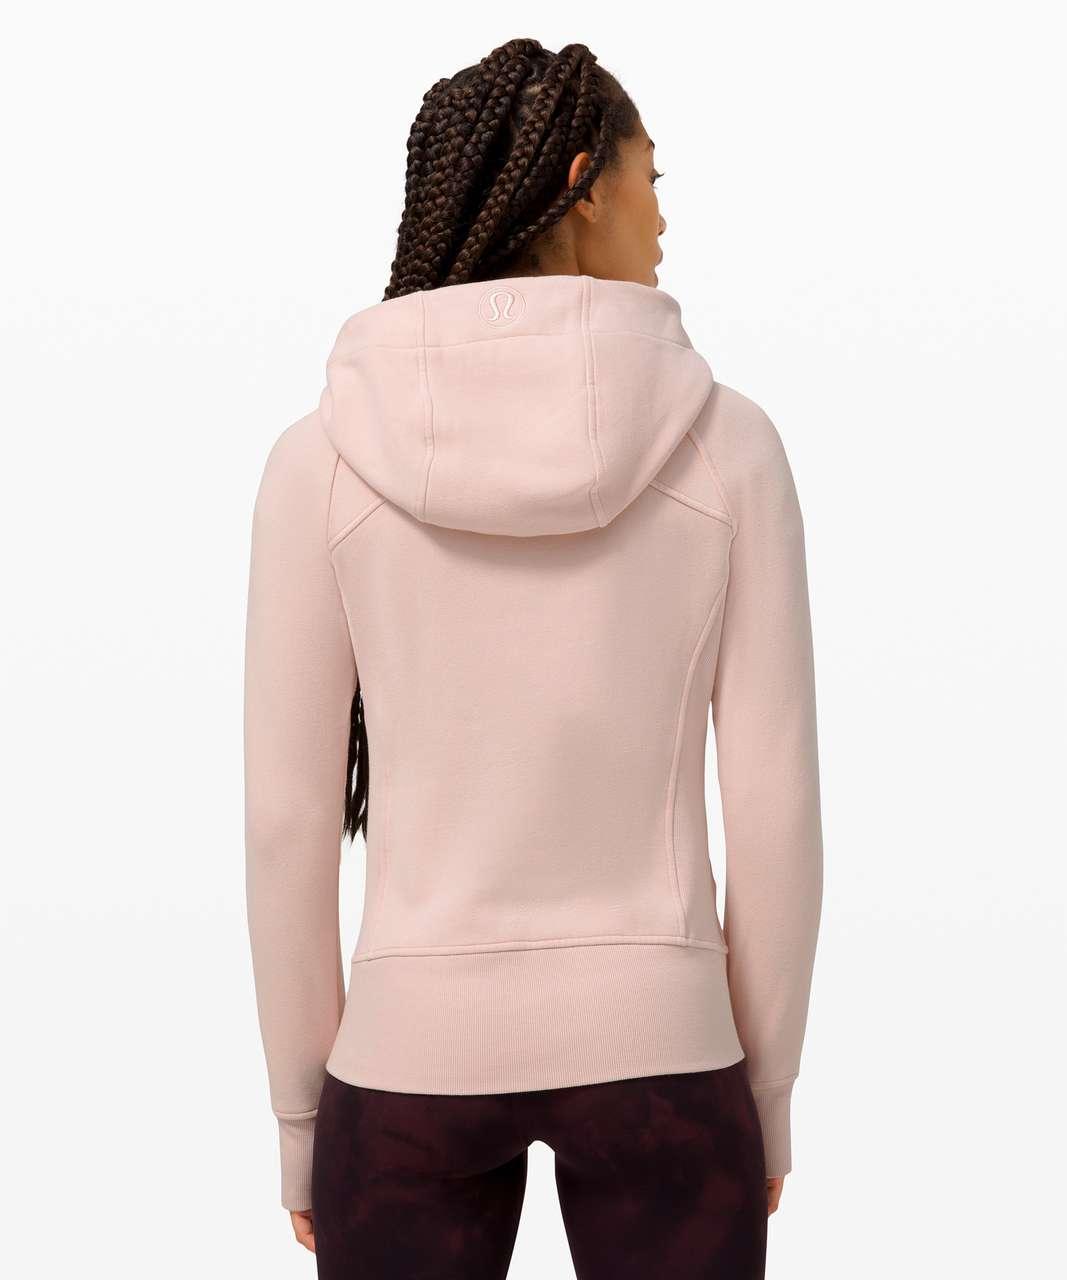 Lululemon Scuba Hoodie *Light Cotton Fleece - Feather Pink